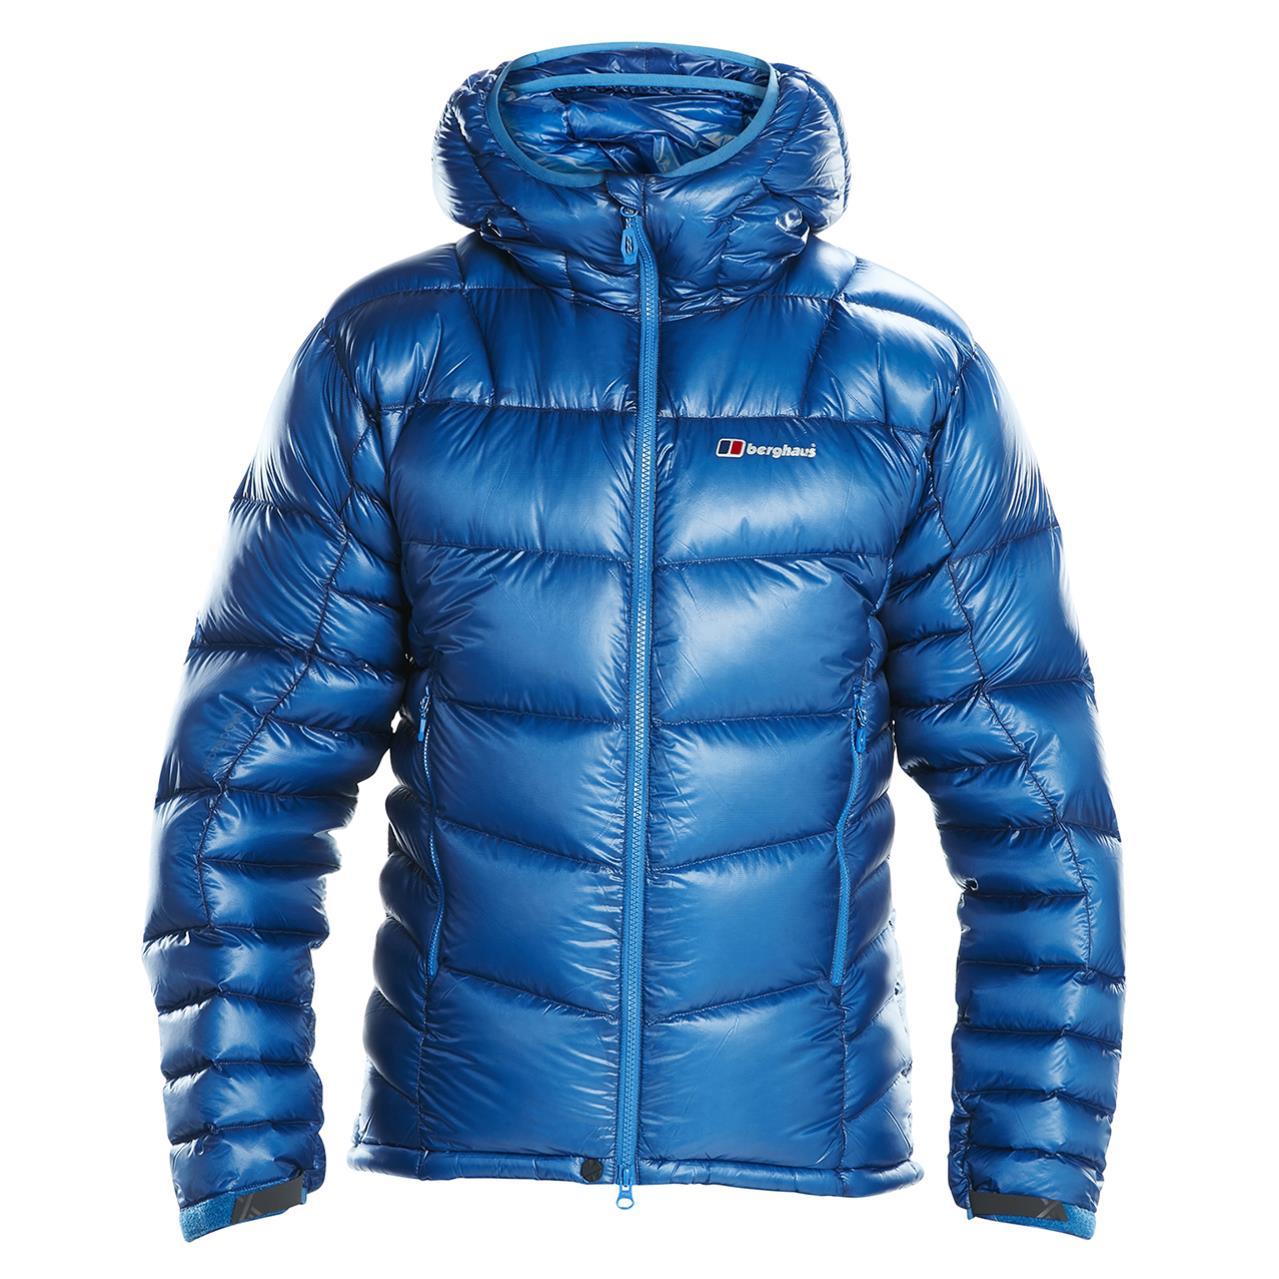 berghaus Ramche Down 2.0 Jacket Herren Daunenjacke blau*